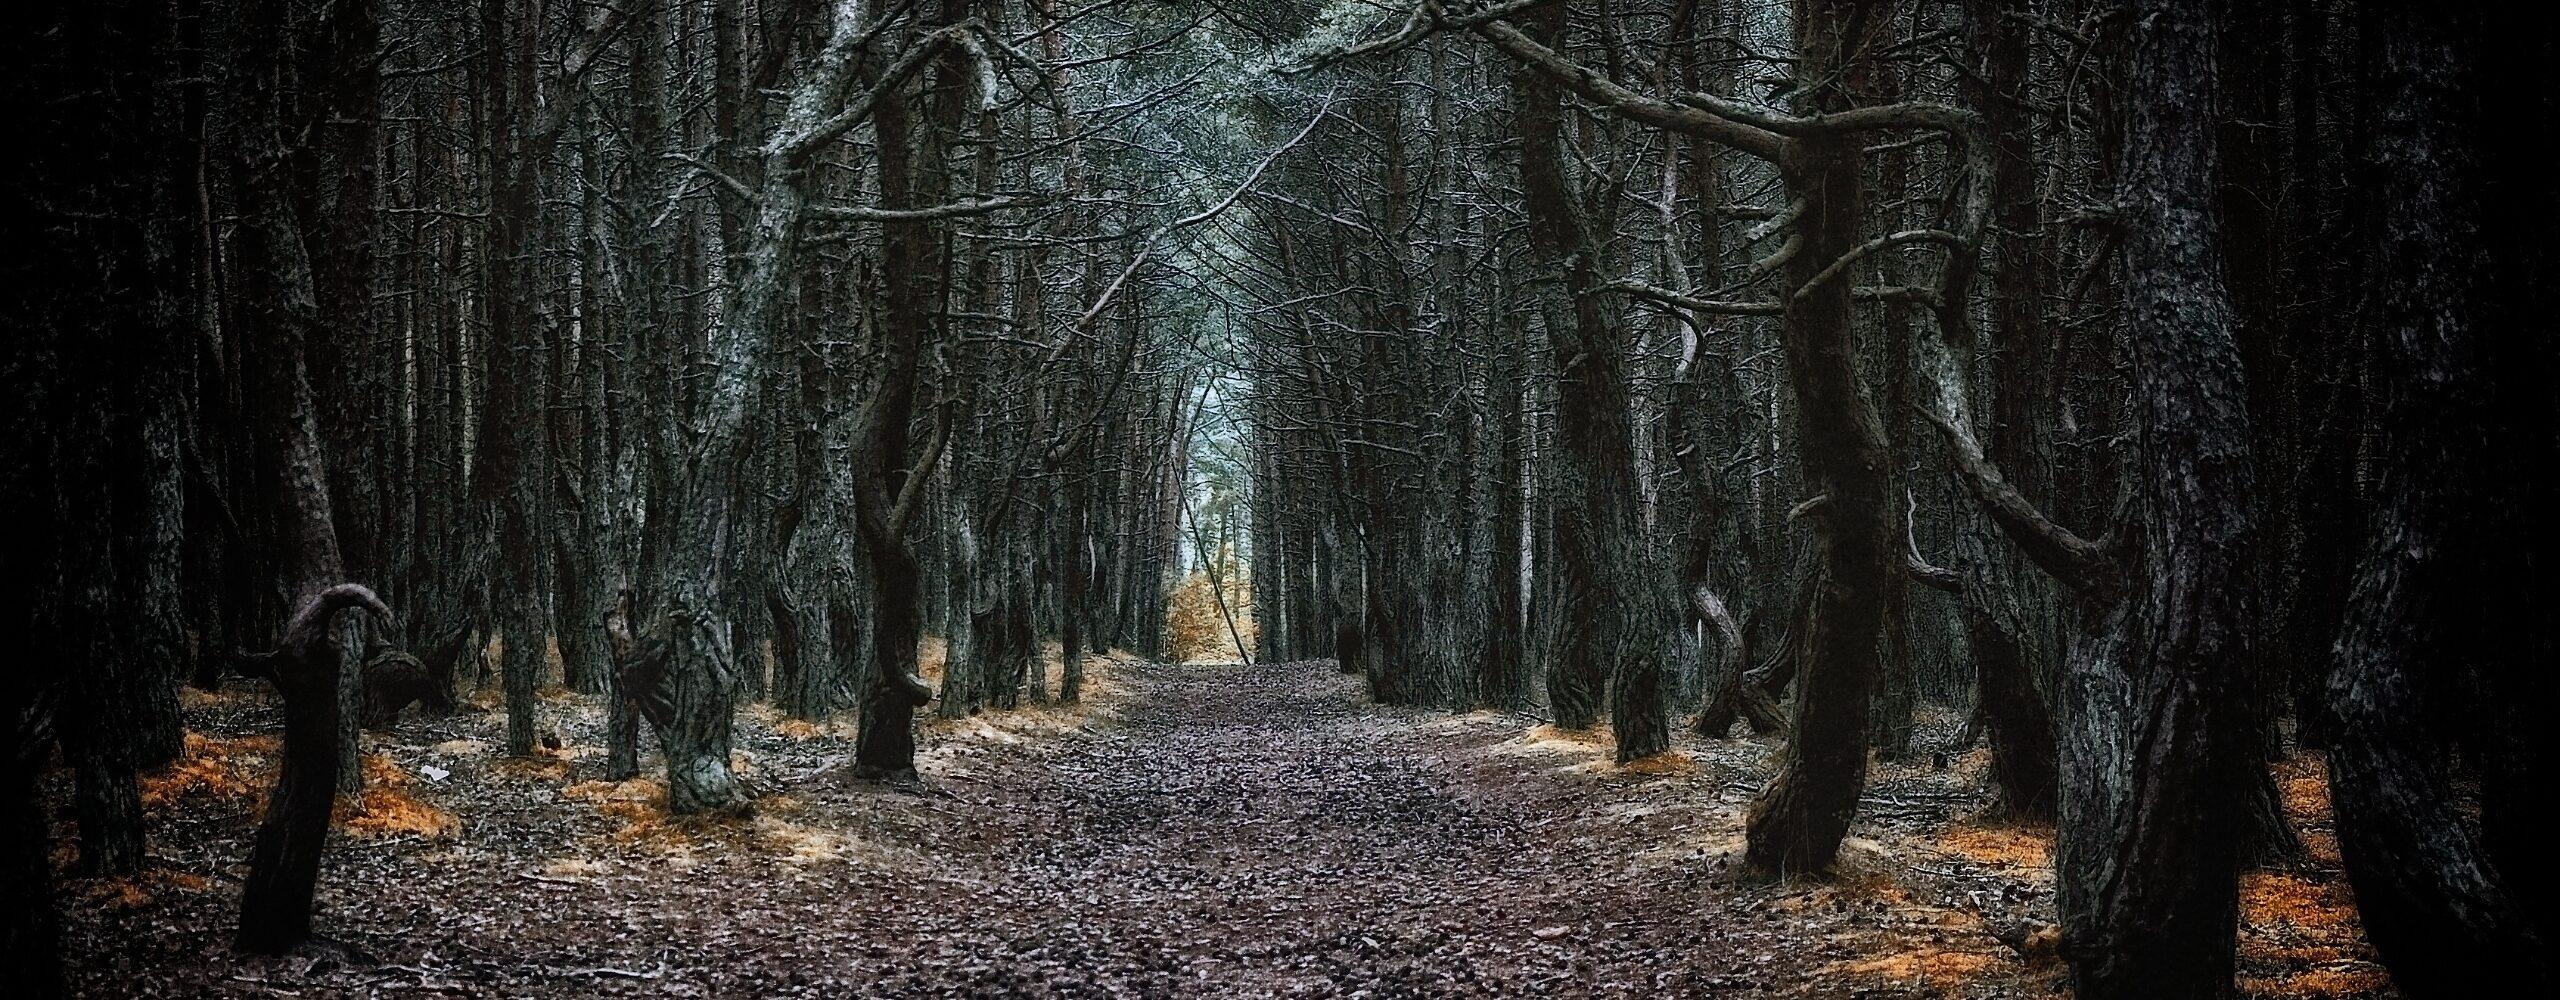 Куршская коса часть 2: Танцующий лес иВысота Эфа